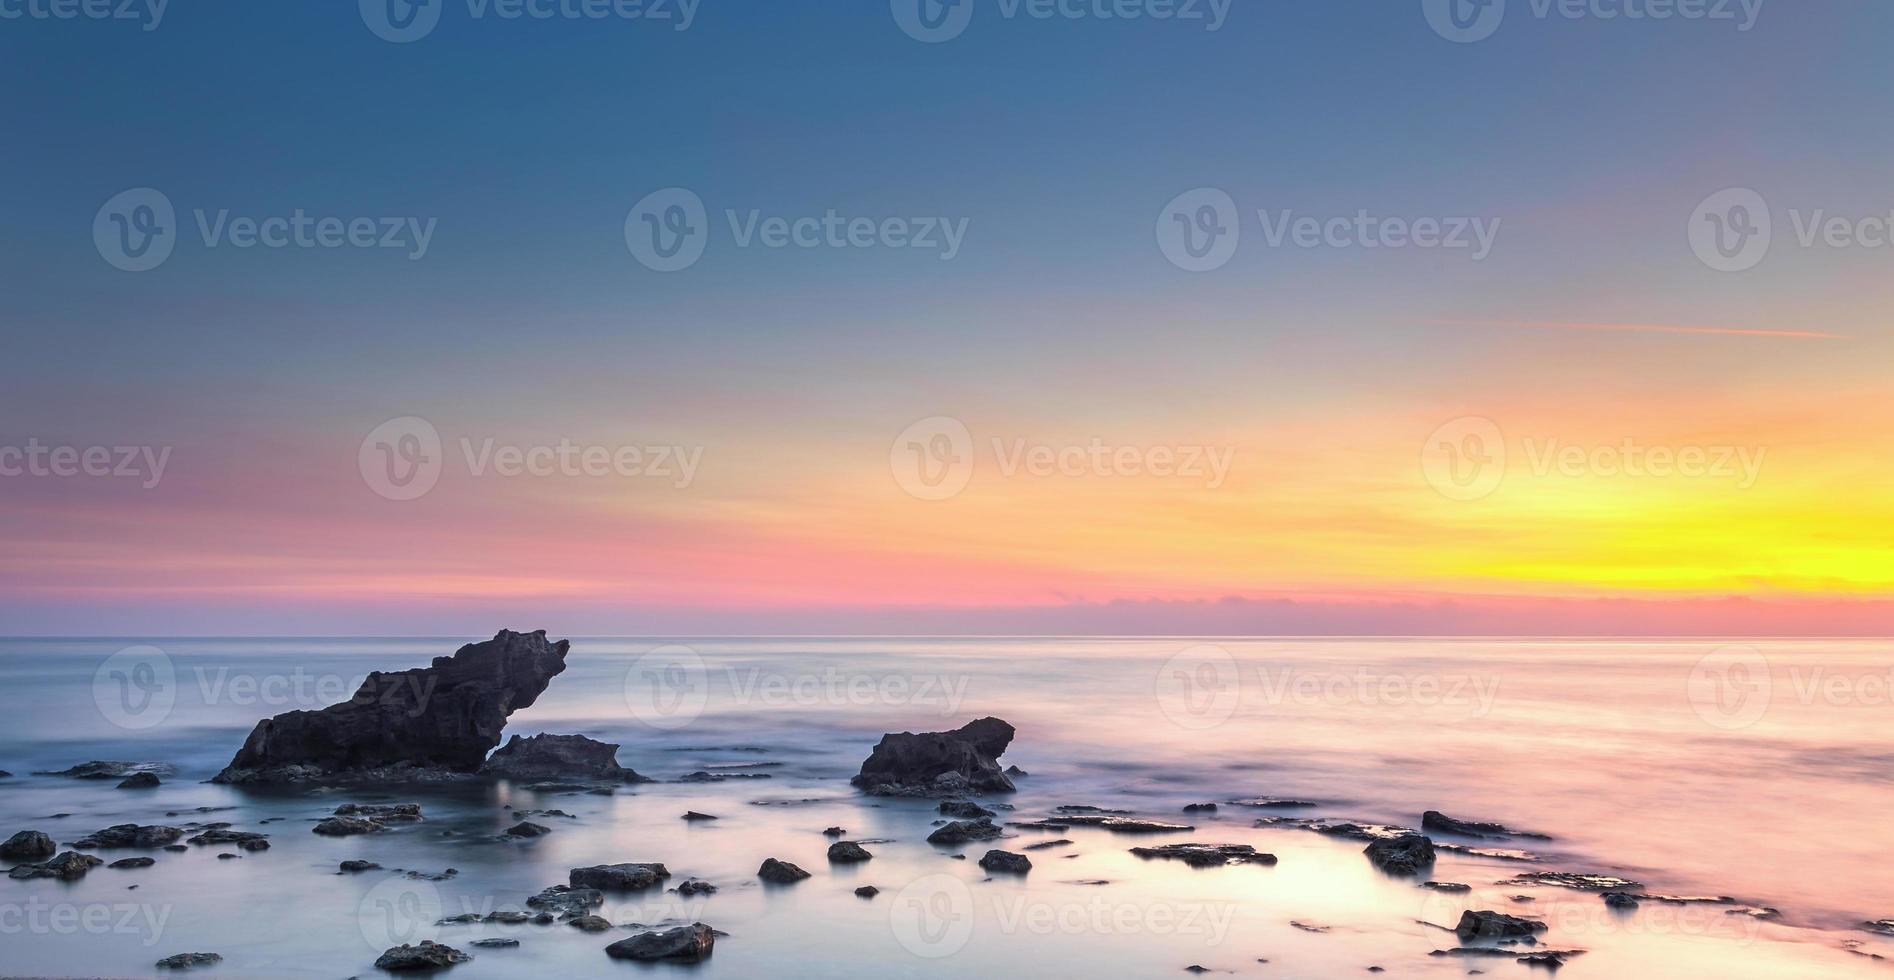 castiglioncello rock e mar no pôr do sol. Toscana, Itália. foto